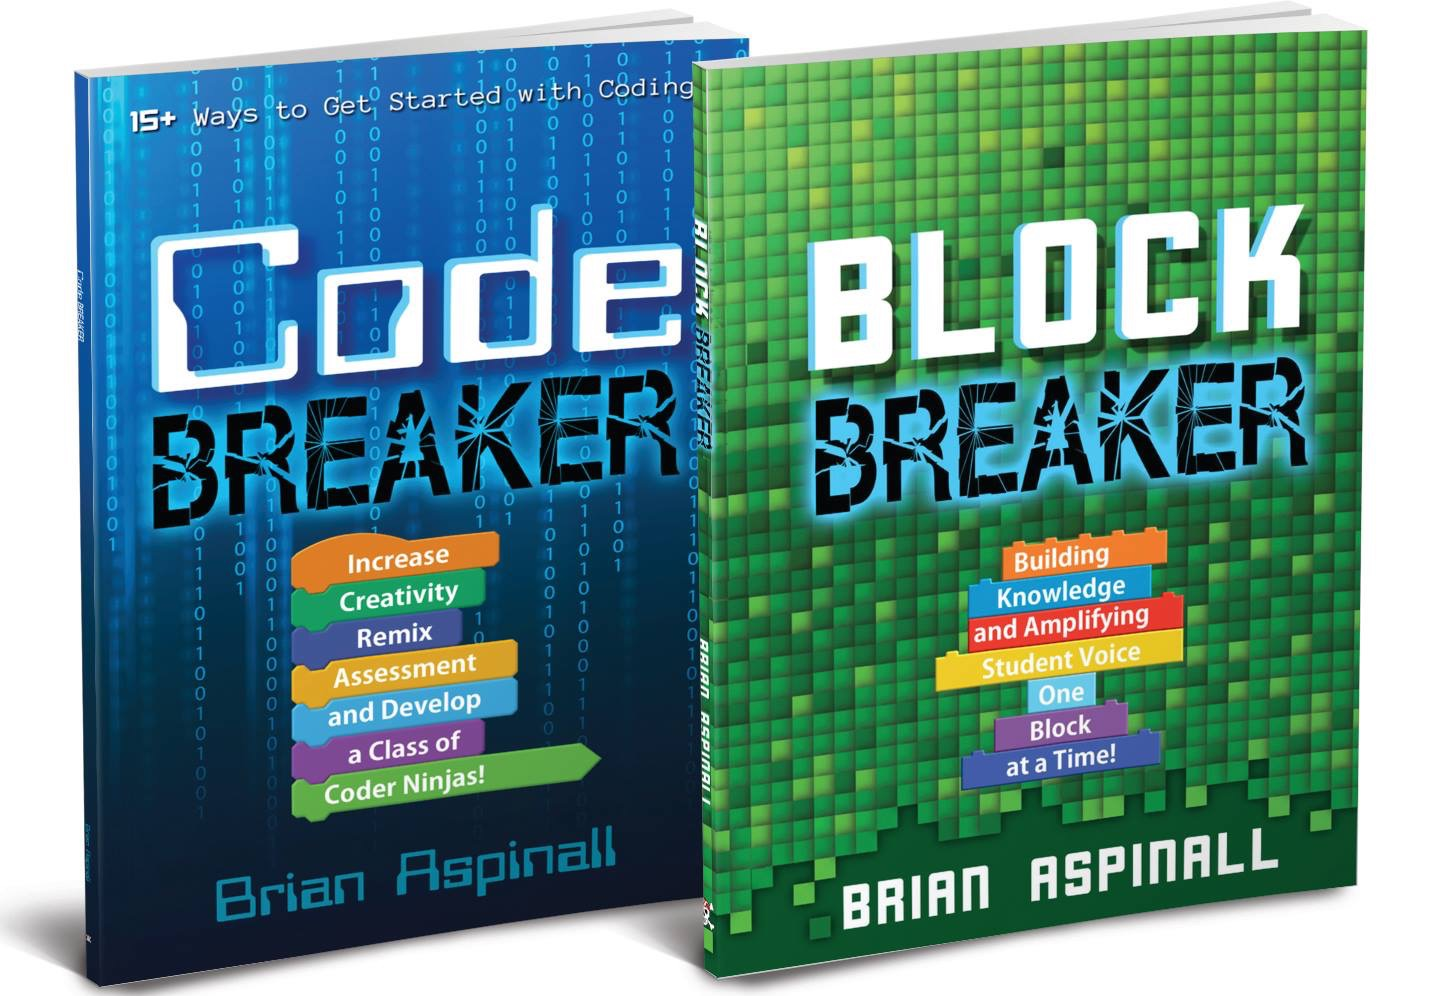 Brian Aspinall – Blog: Teacher, Speaker, Coder, Maker